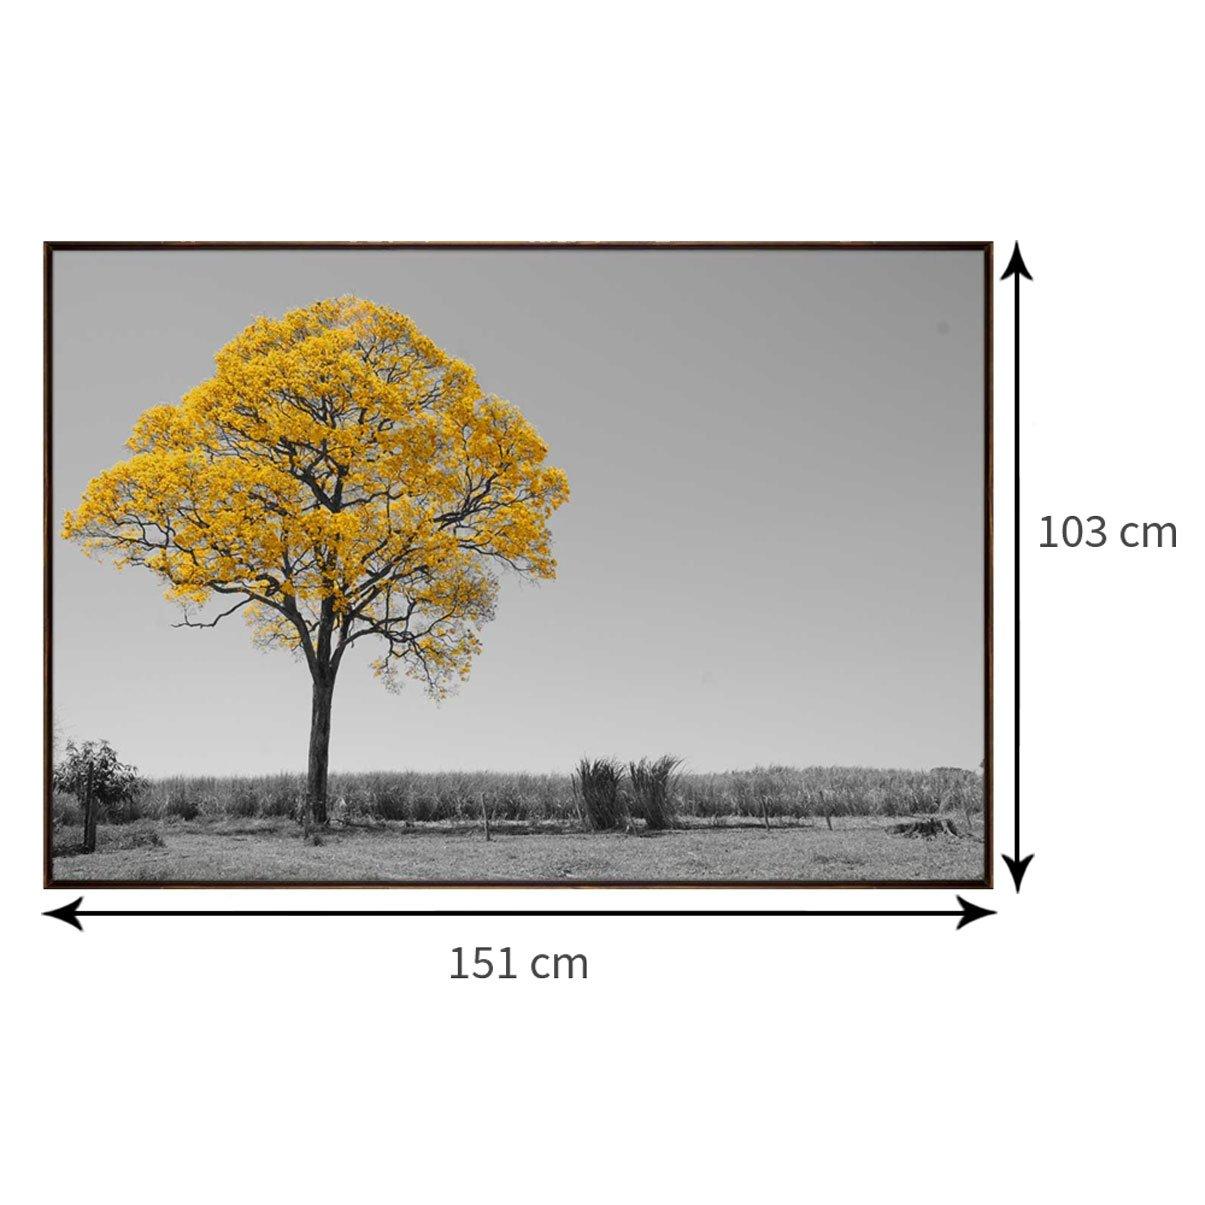 Tela Decorativa Ipê Amarelo 150x100 cm Preto e Branco